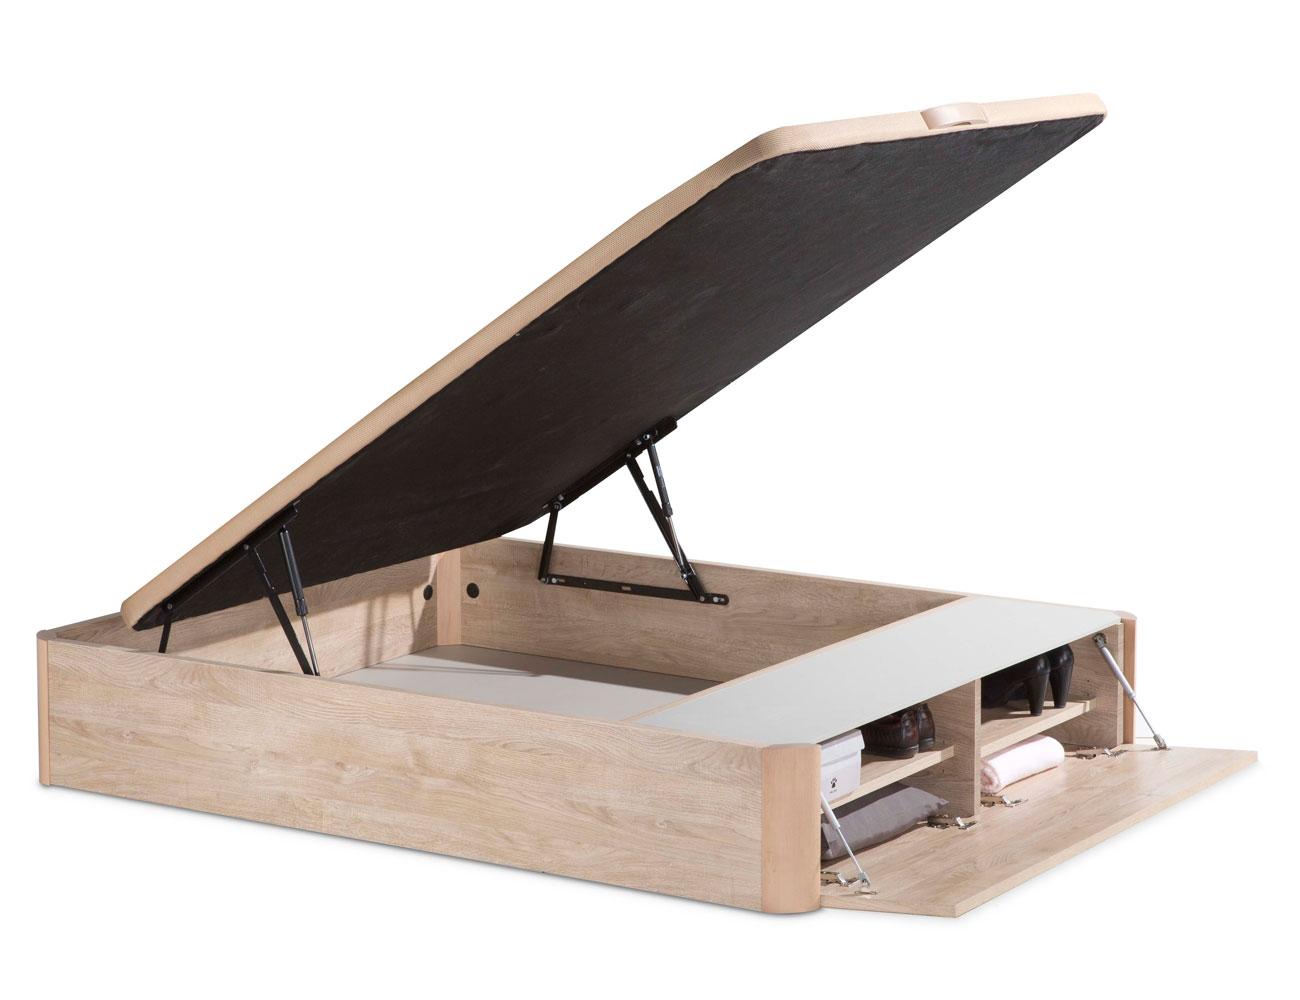 Canape zapatero madera tapa 3d 7614